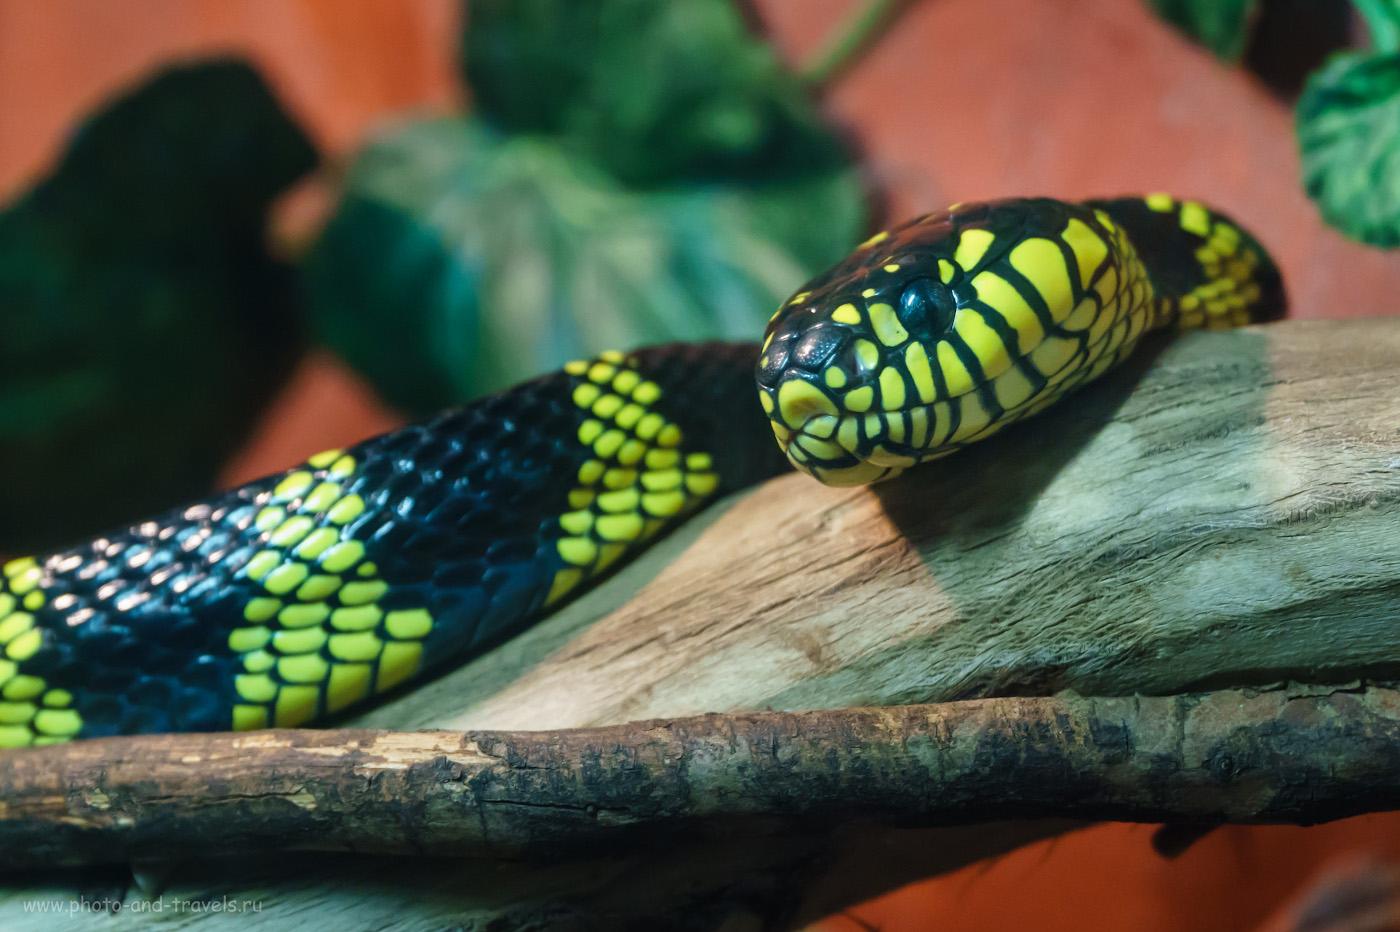 Фото 14. Фотоохота на змей с помощью тревел-зума Sony 18-105mm f/4, установленного на тушке Sony A6000. Снято без вспышки. Параметры съемки: 1/100, +0.7, 3200, 77.